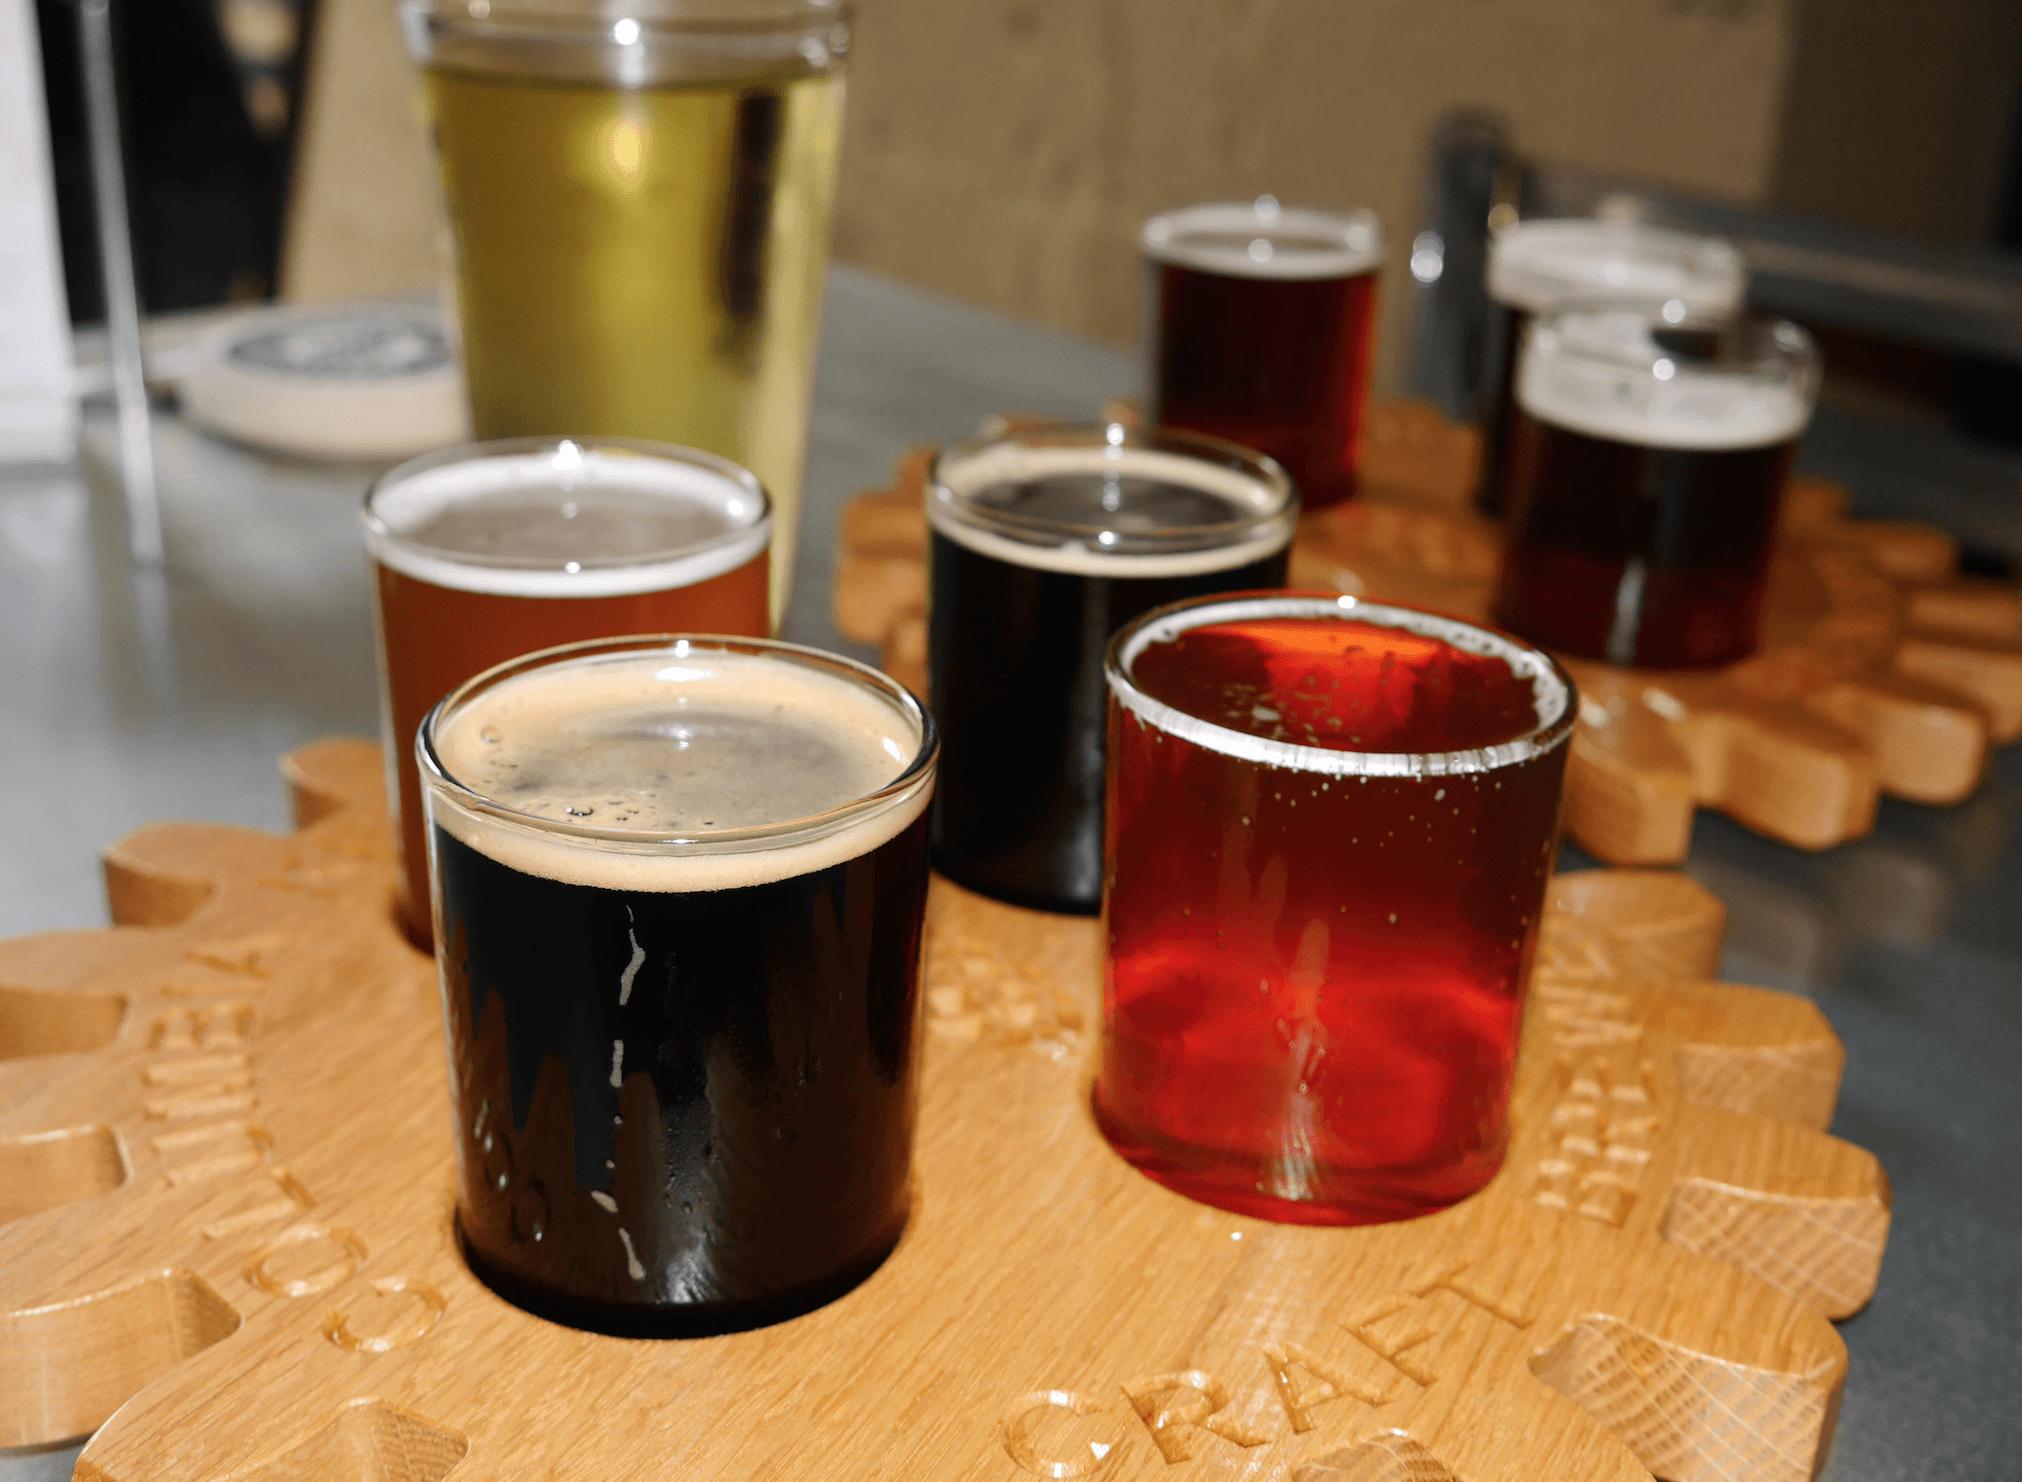 Columbia Kettle Works Microbrewery craft beers